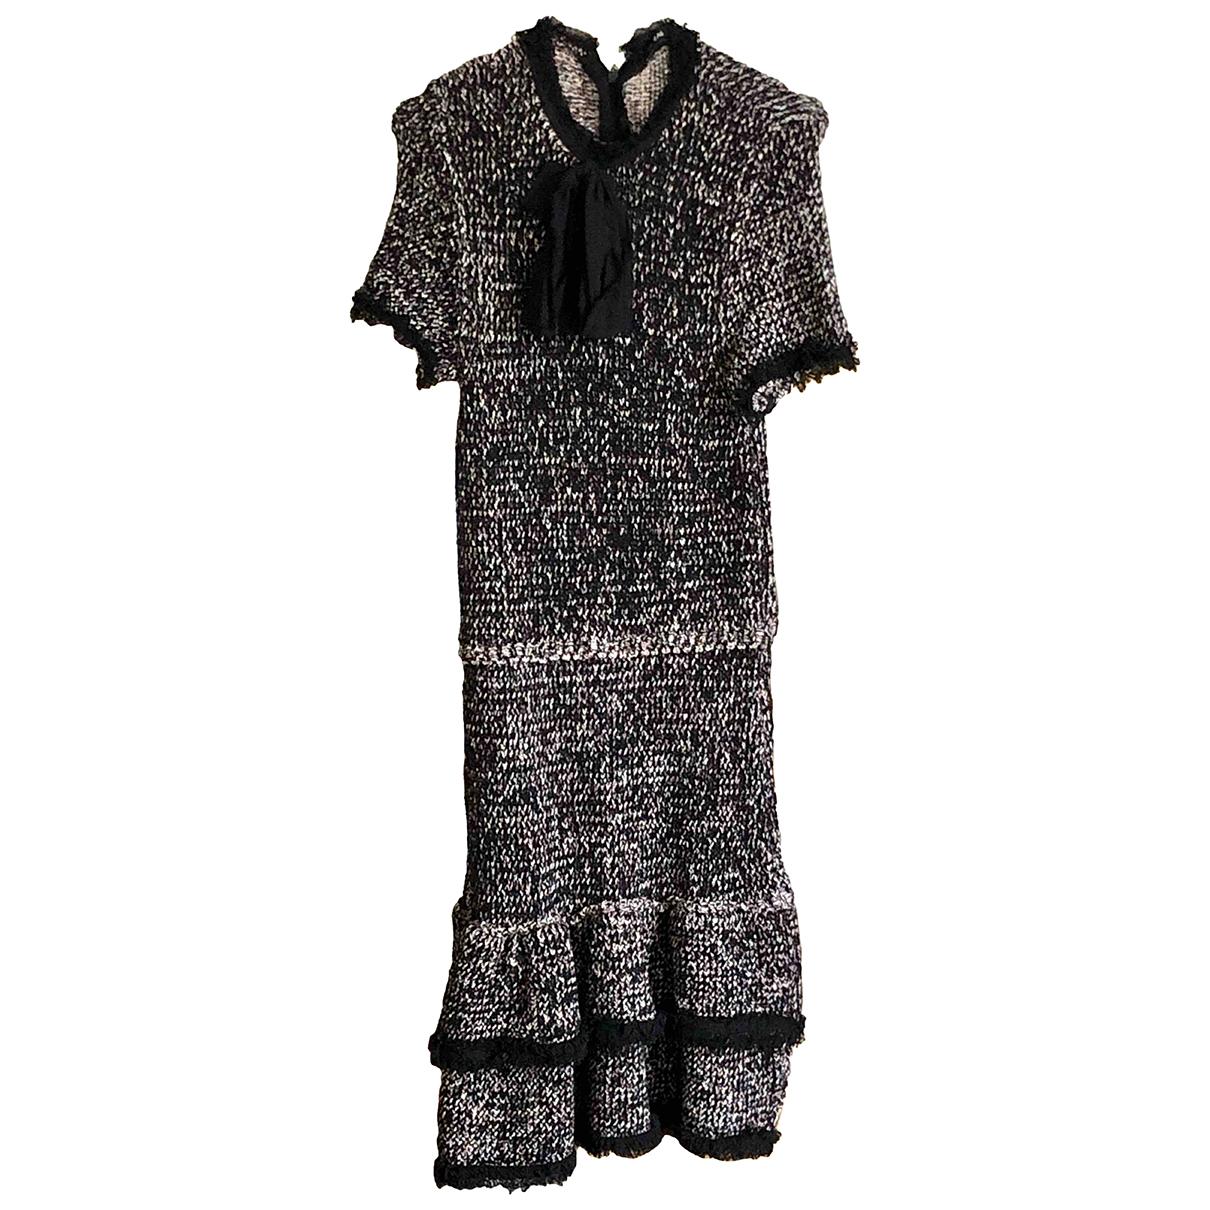 Zara \N Kleid in  Schwarz Baumwolle - Elasthan